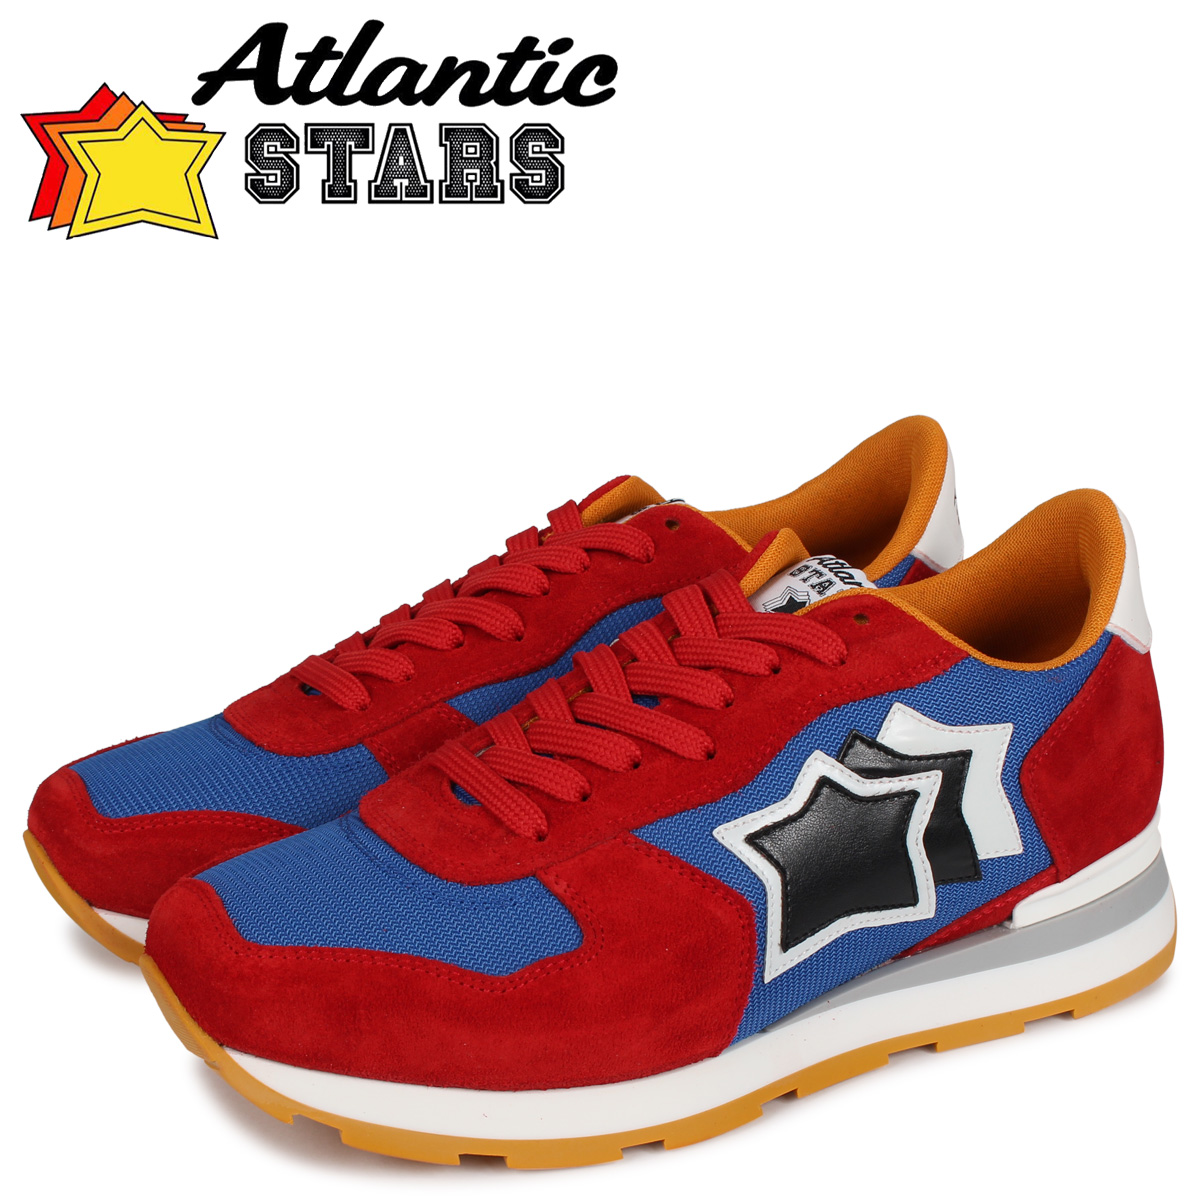 Atlantic STARS アトランティックスターズ アンタレス スニーカー メンズ ANTARES レッド FAA-50B